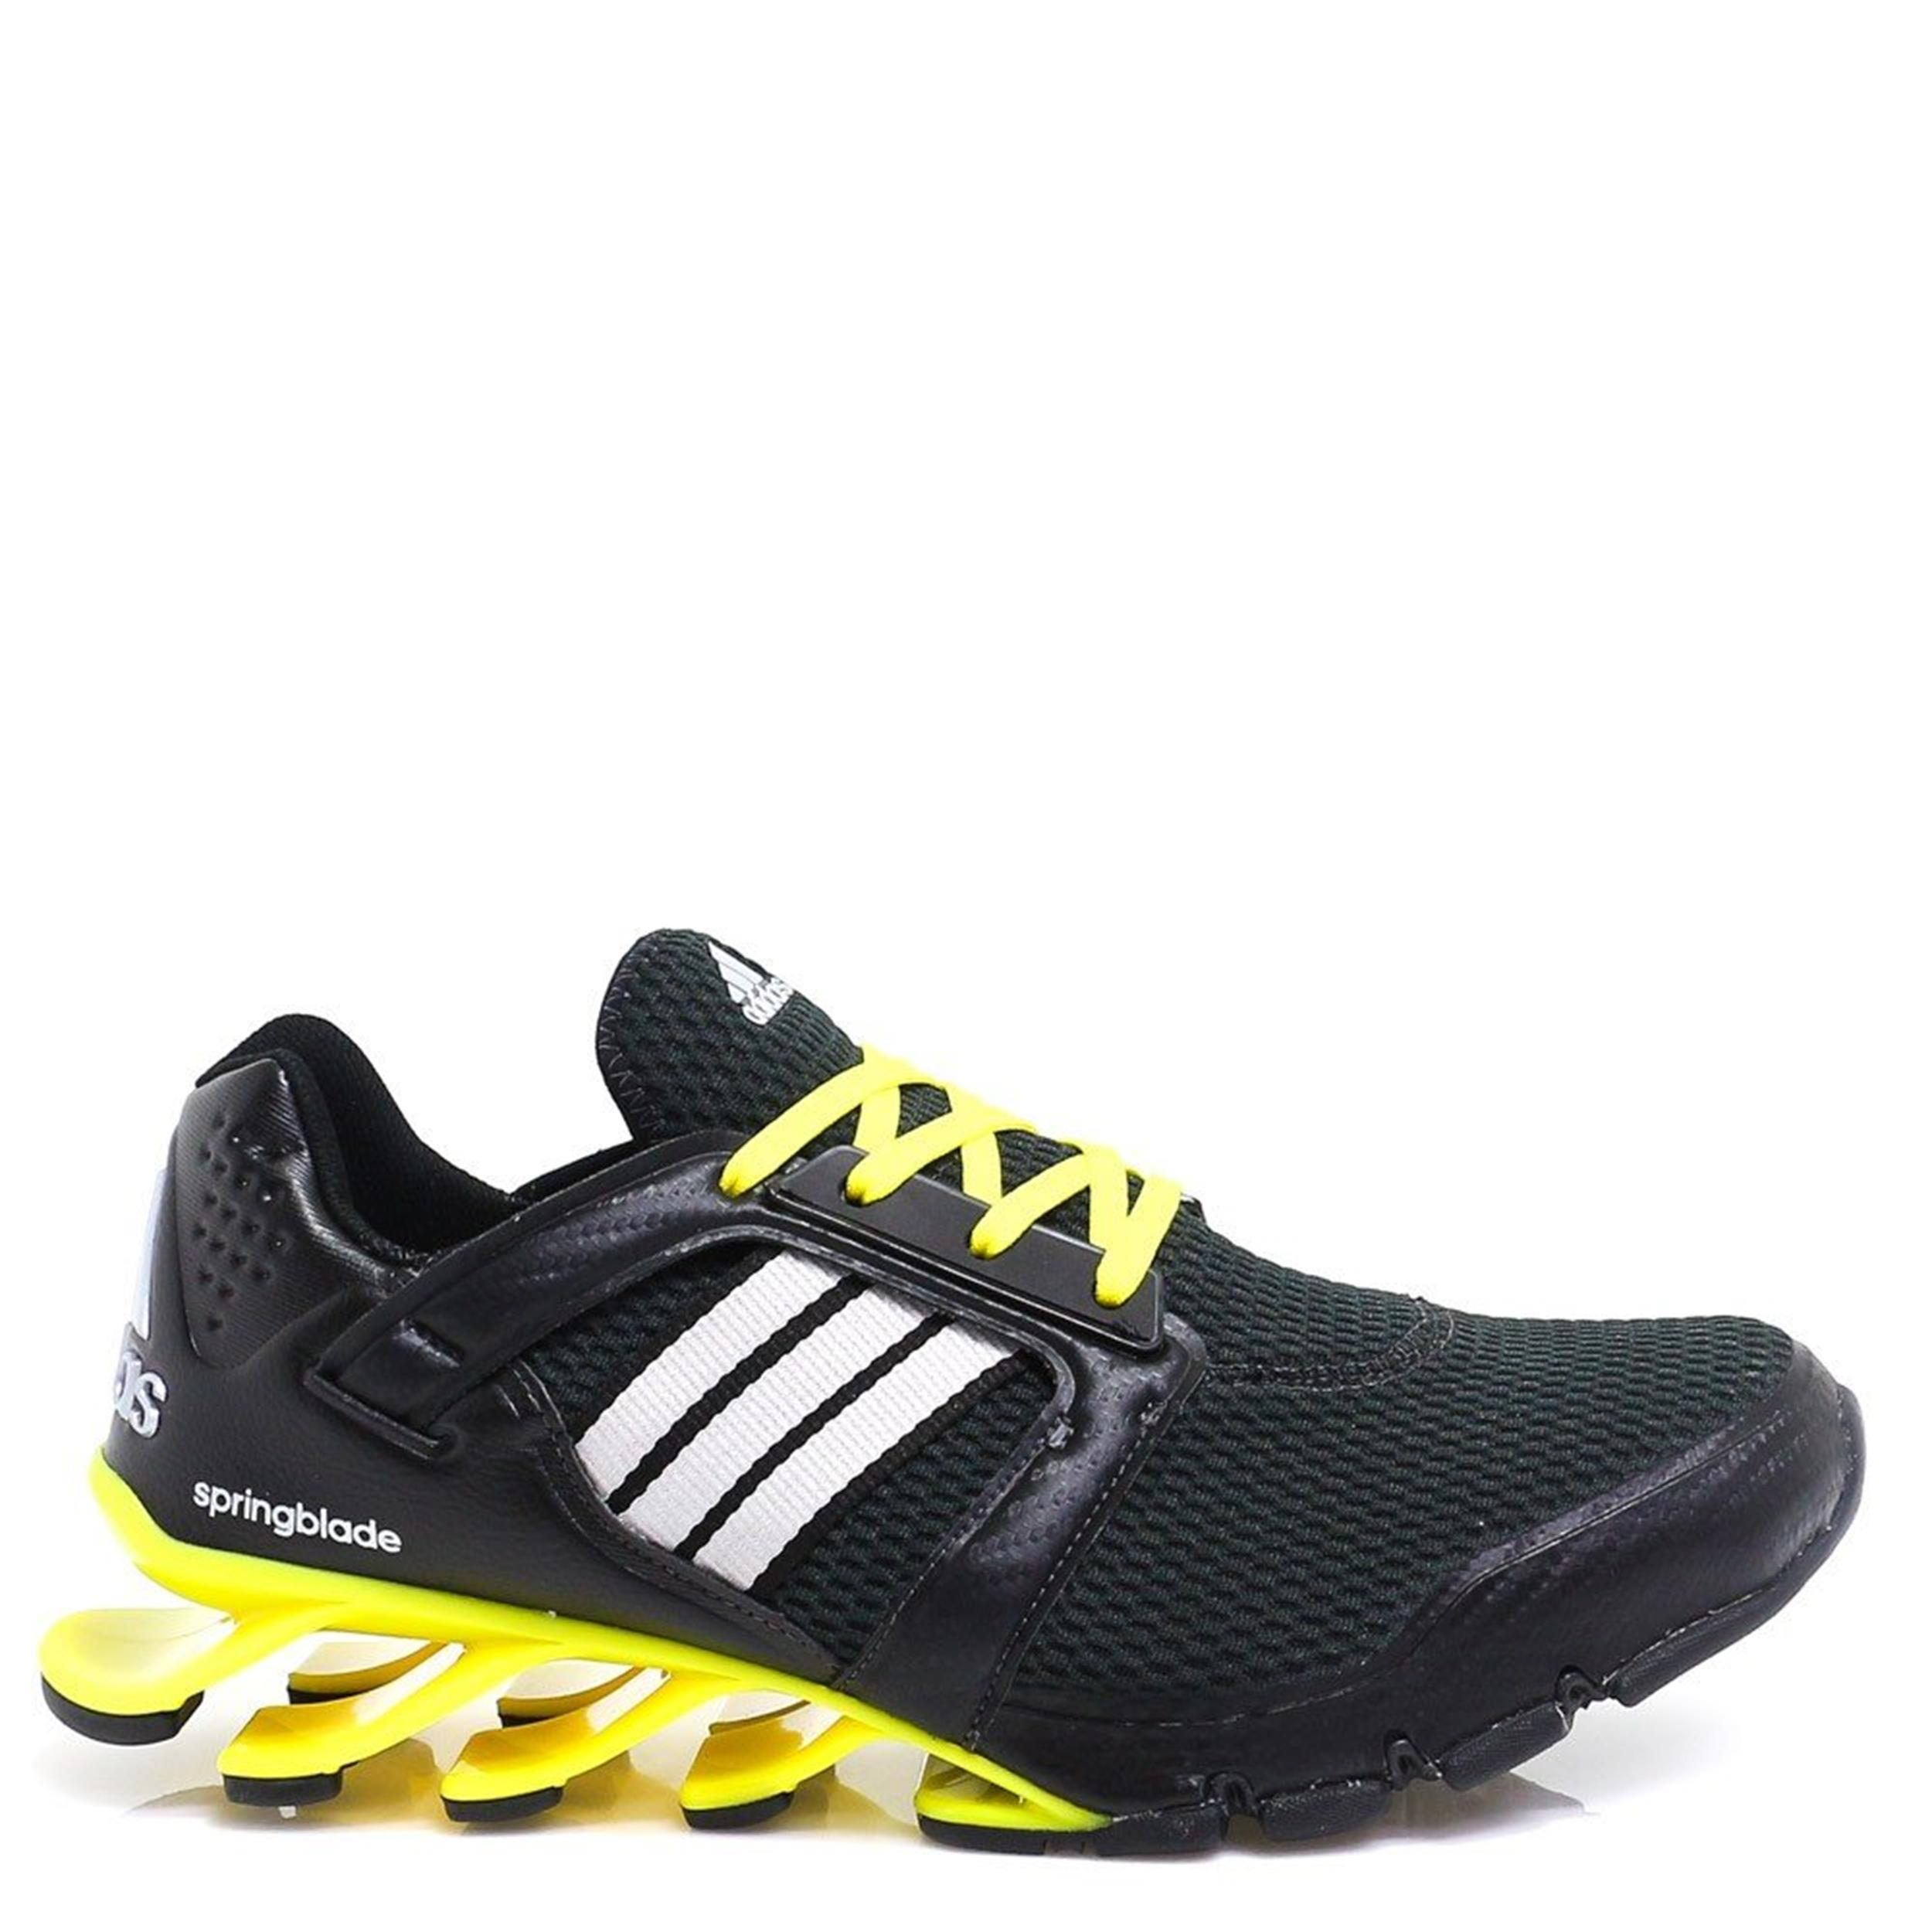 62cc08bf60 Tênis Adidas E-force Springblade Running